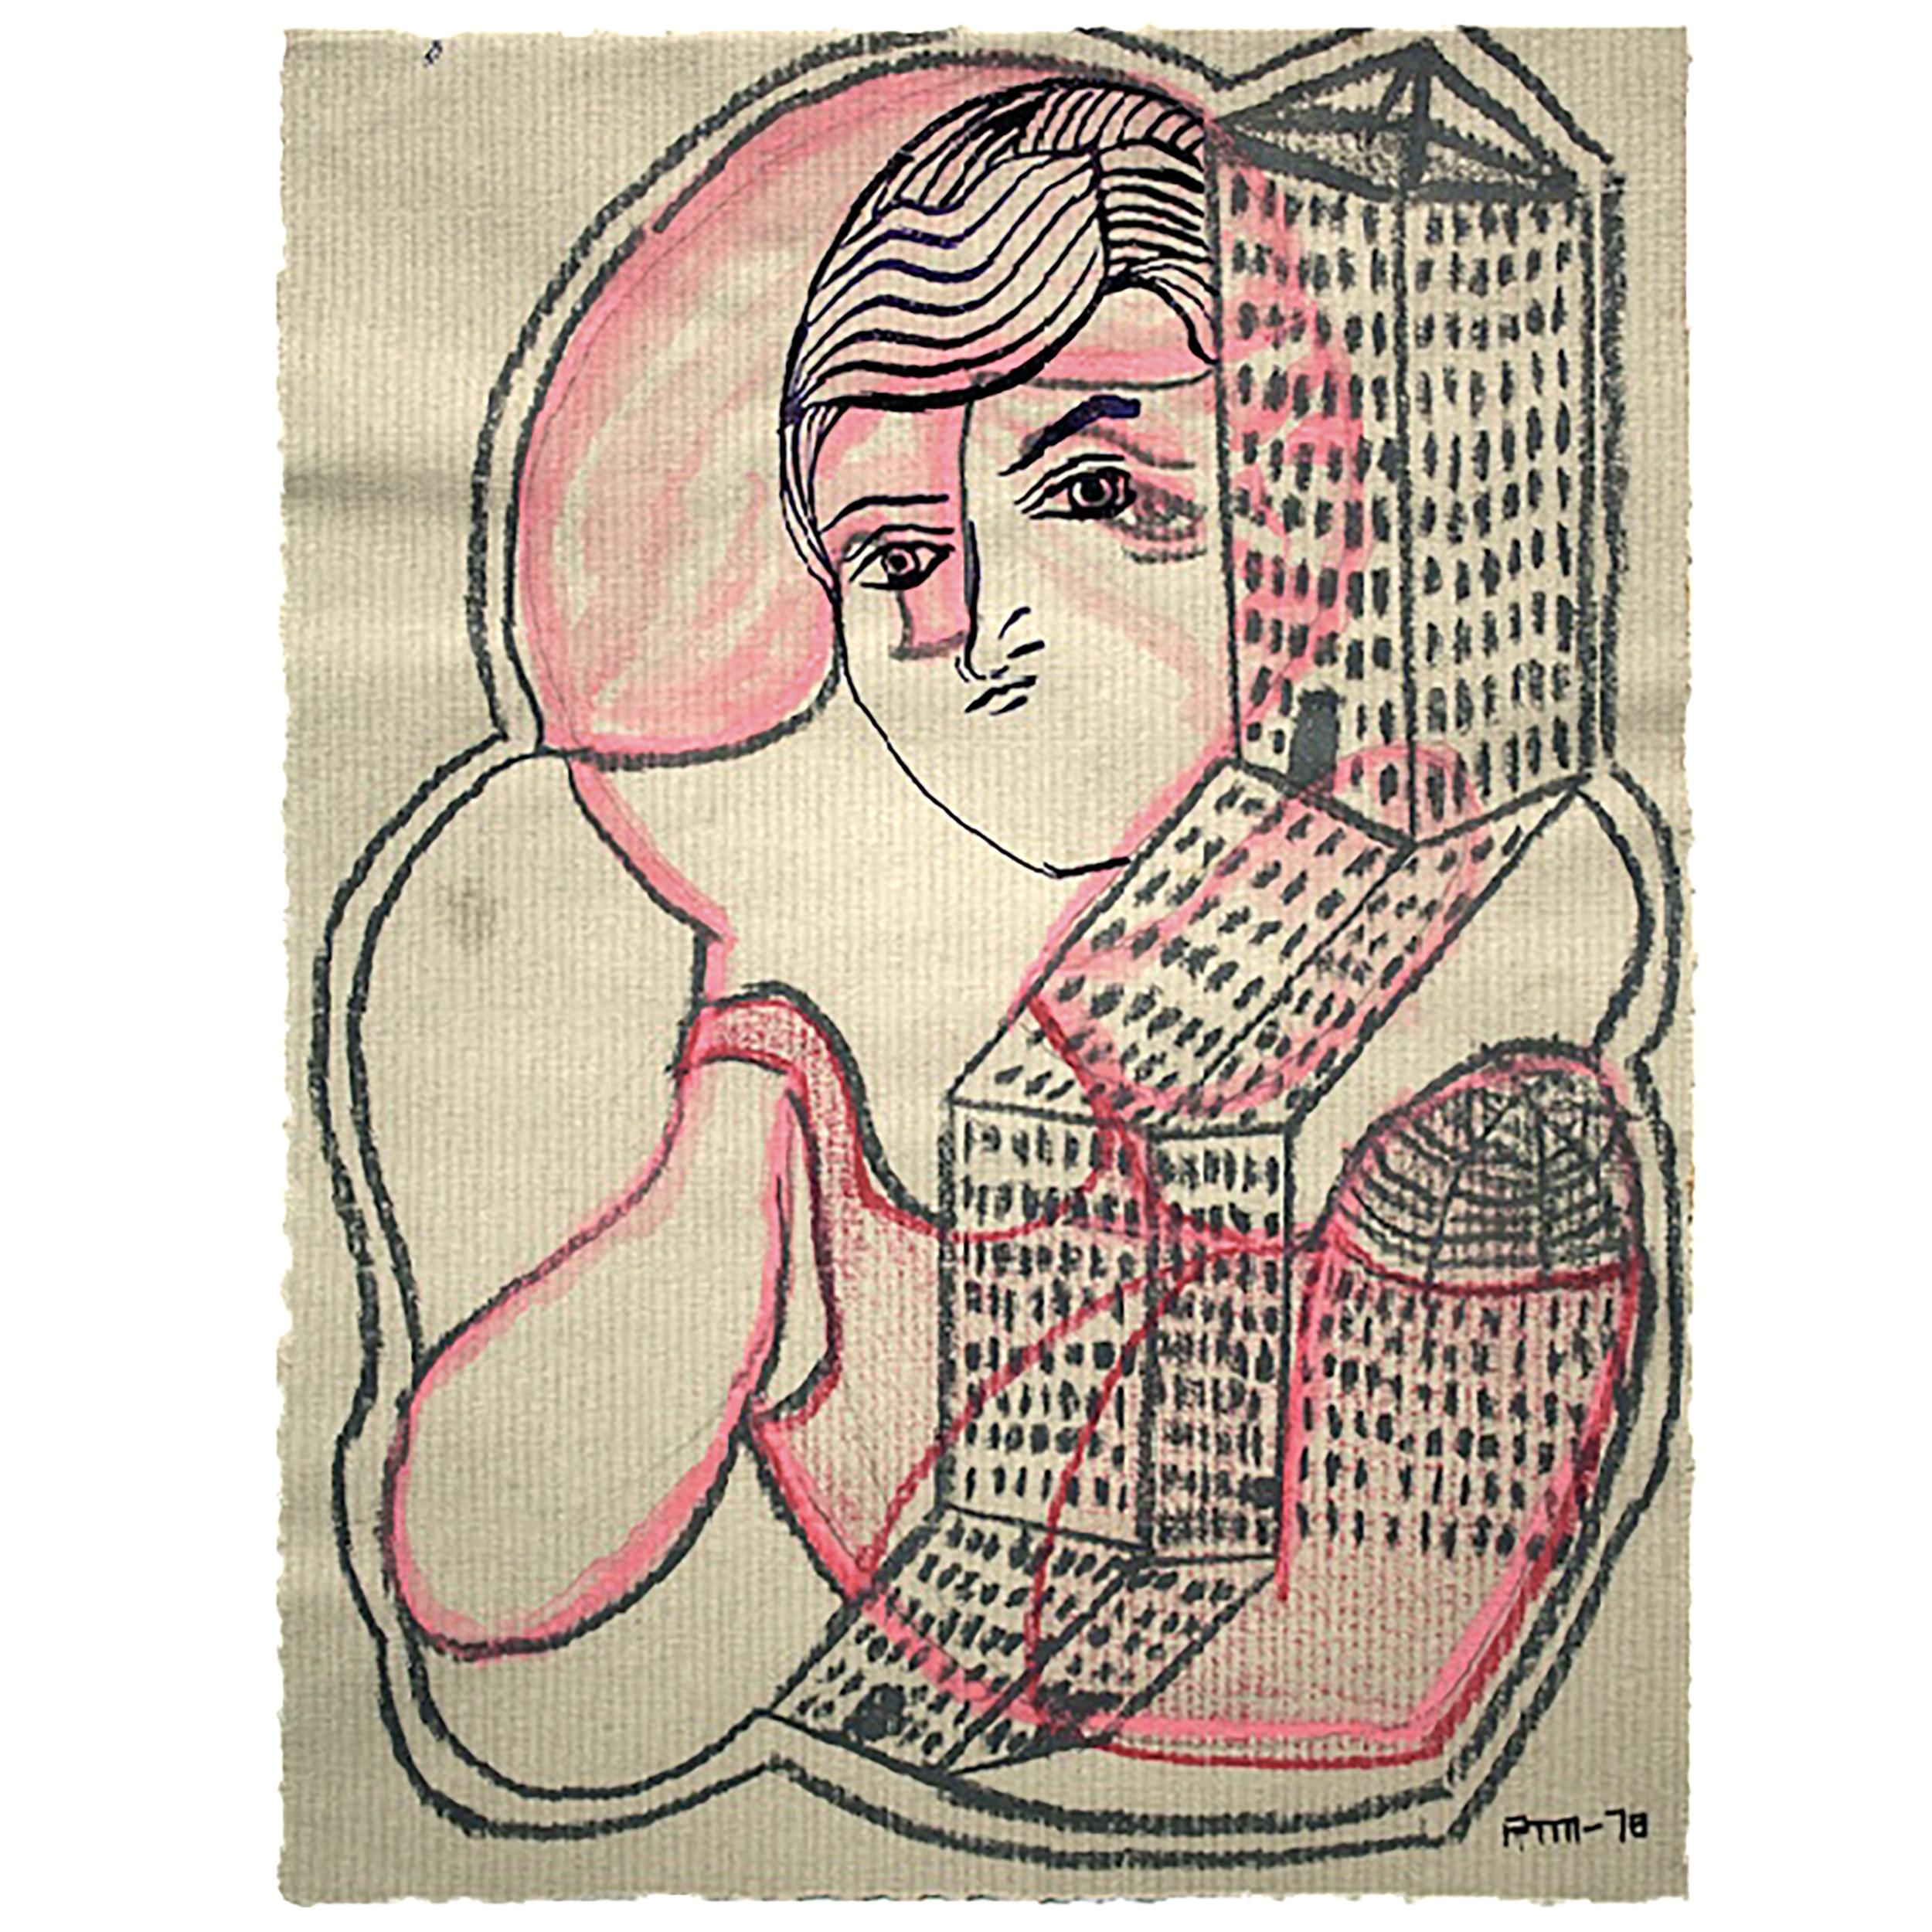 Breath, n/d (dated 78)